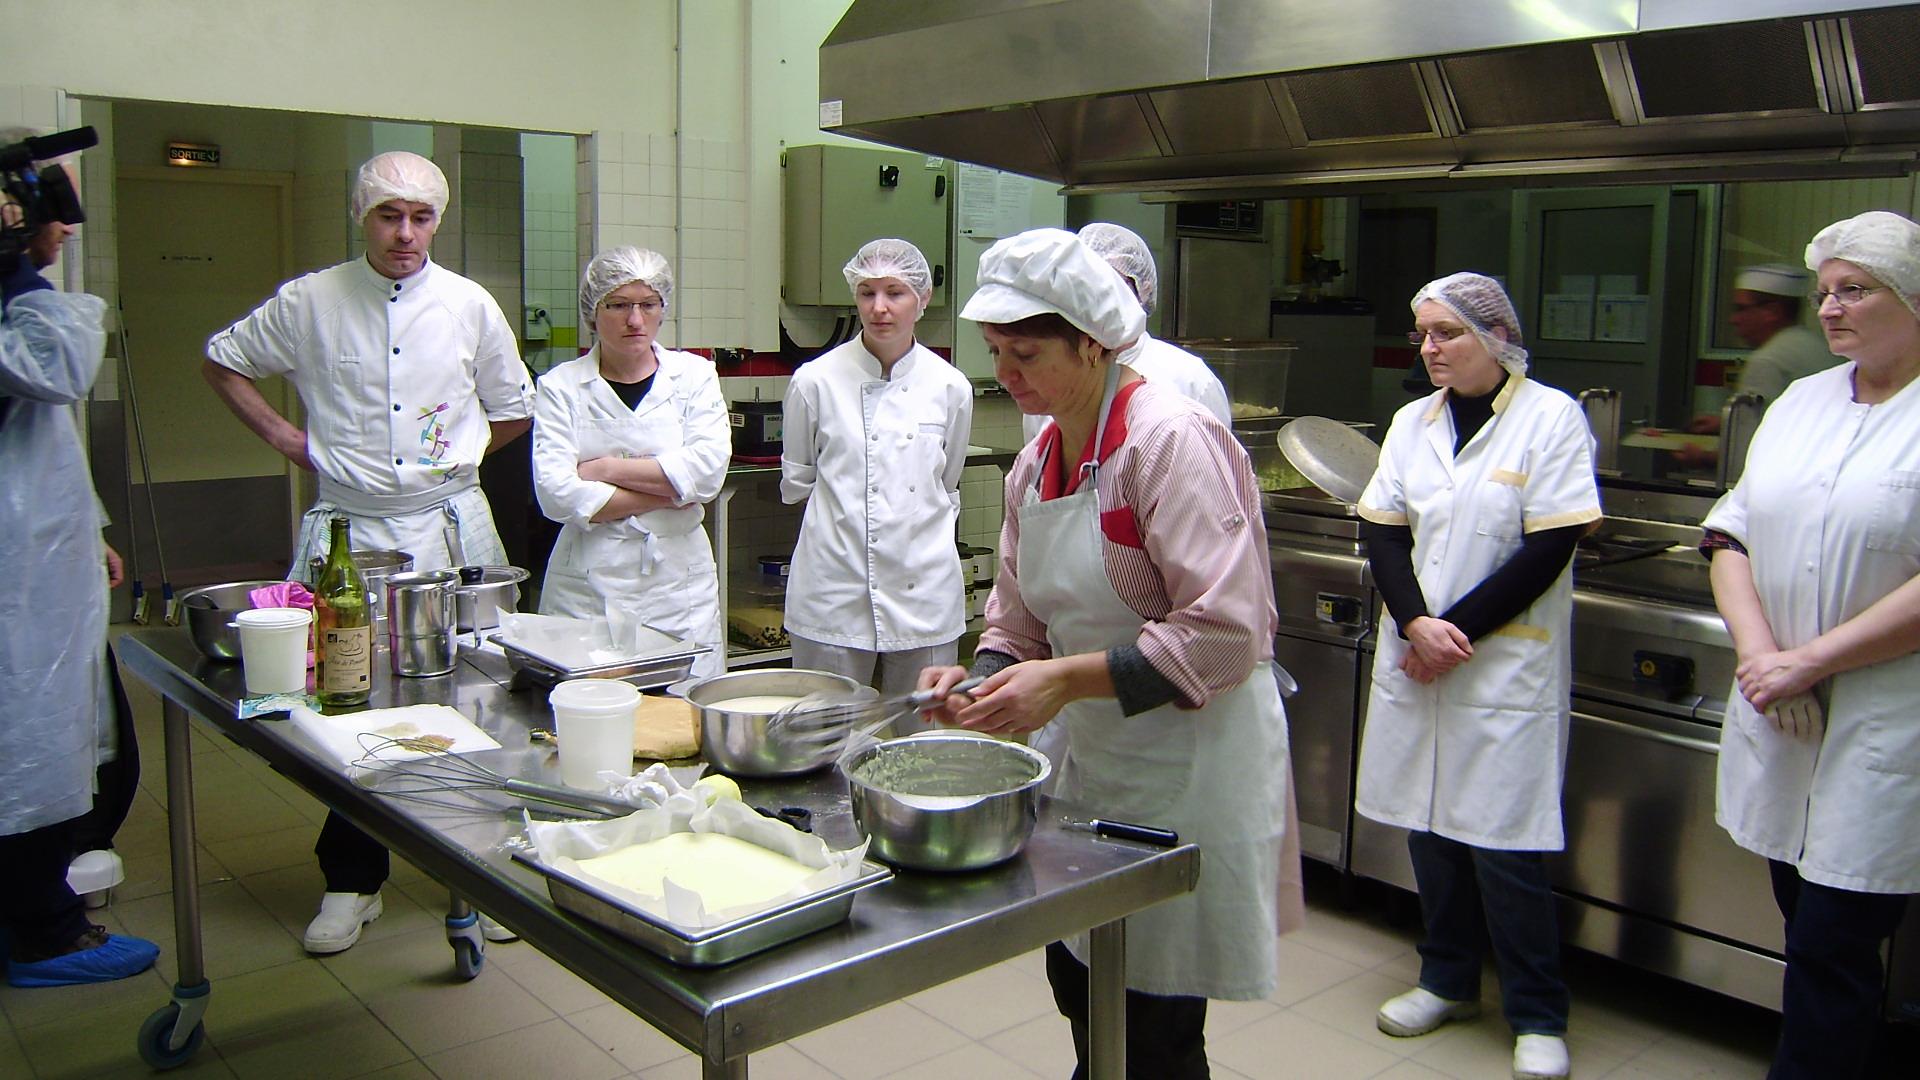 Restauration collective for Emploi cuisine centrale restauration